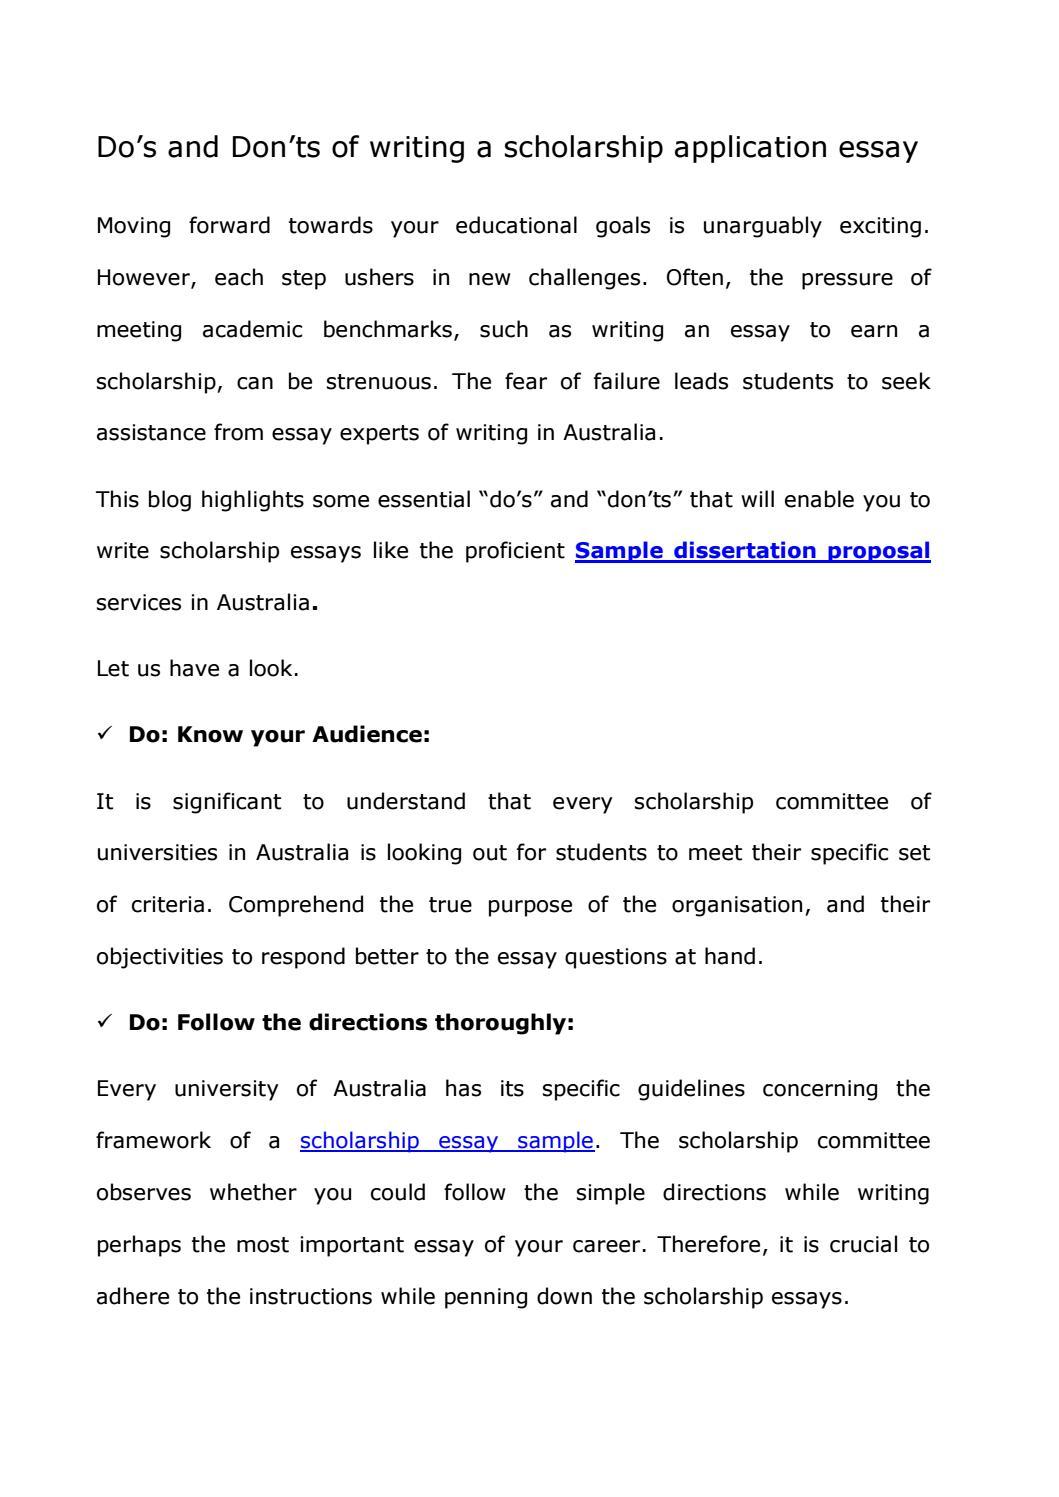 Essay For Applying Scholarship